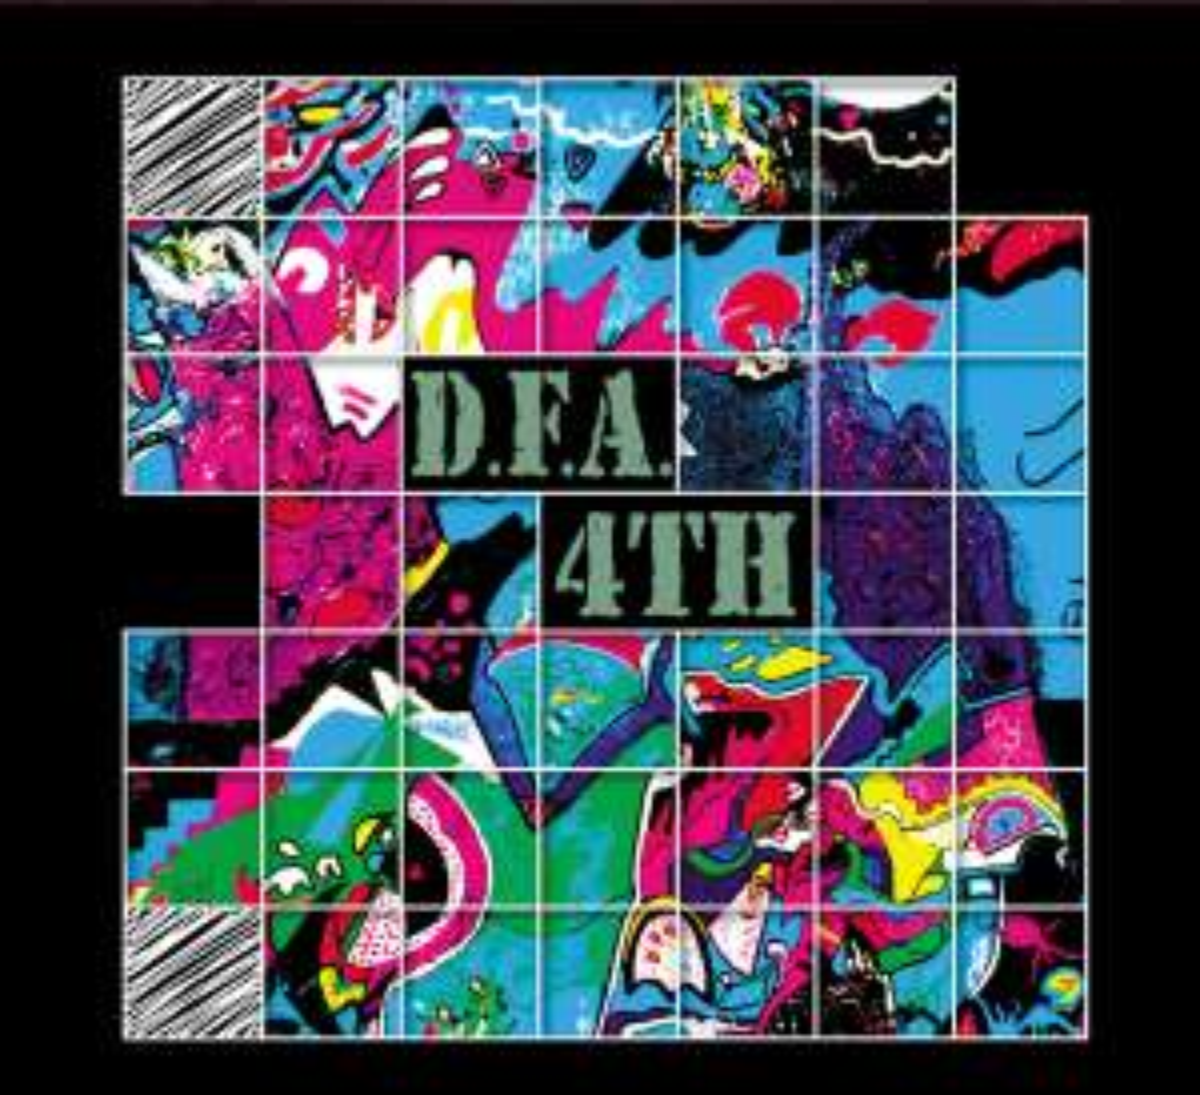 Outstanding  Italian Progressive Rock - D.F.A. - 4th Album (Complete) - Free Download @ DutyFreeArea.Bandcamp.Com